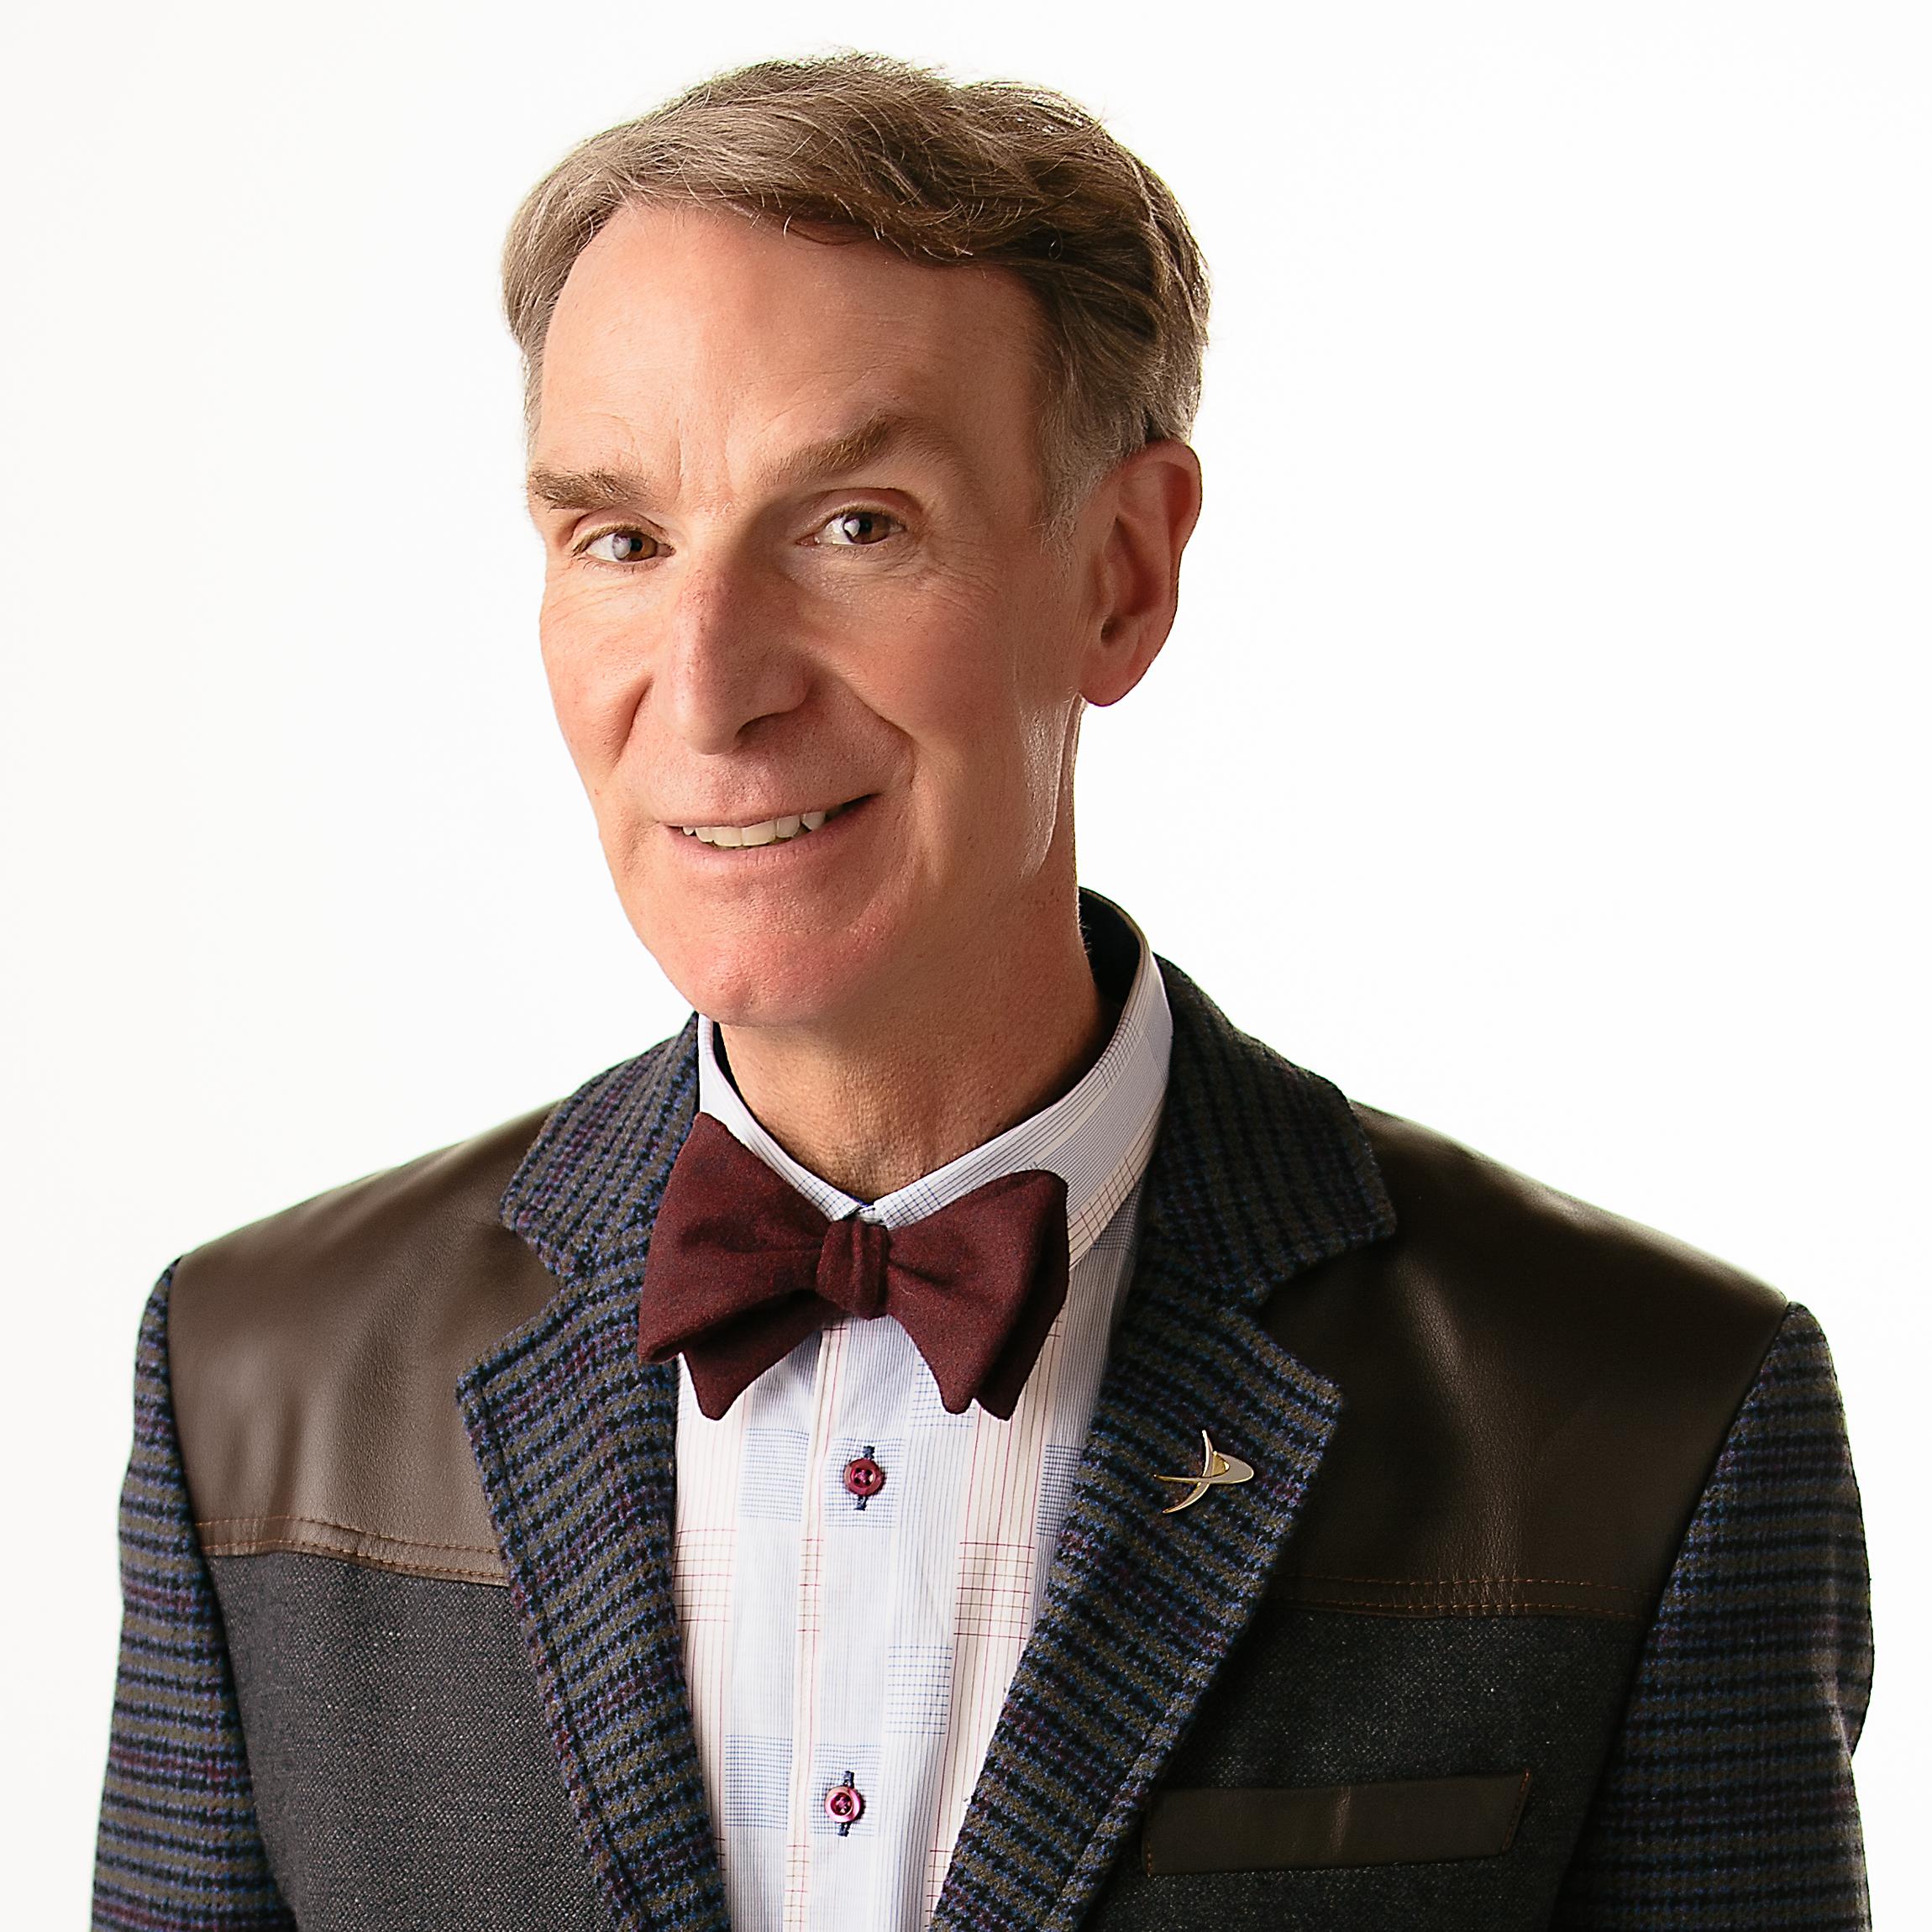 palin as much a scientist as bill nye factcheck org